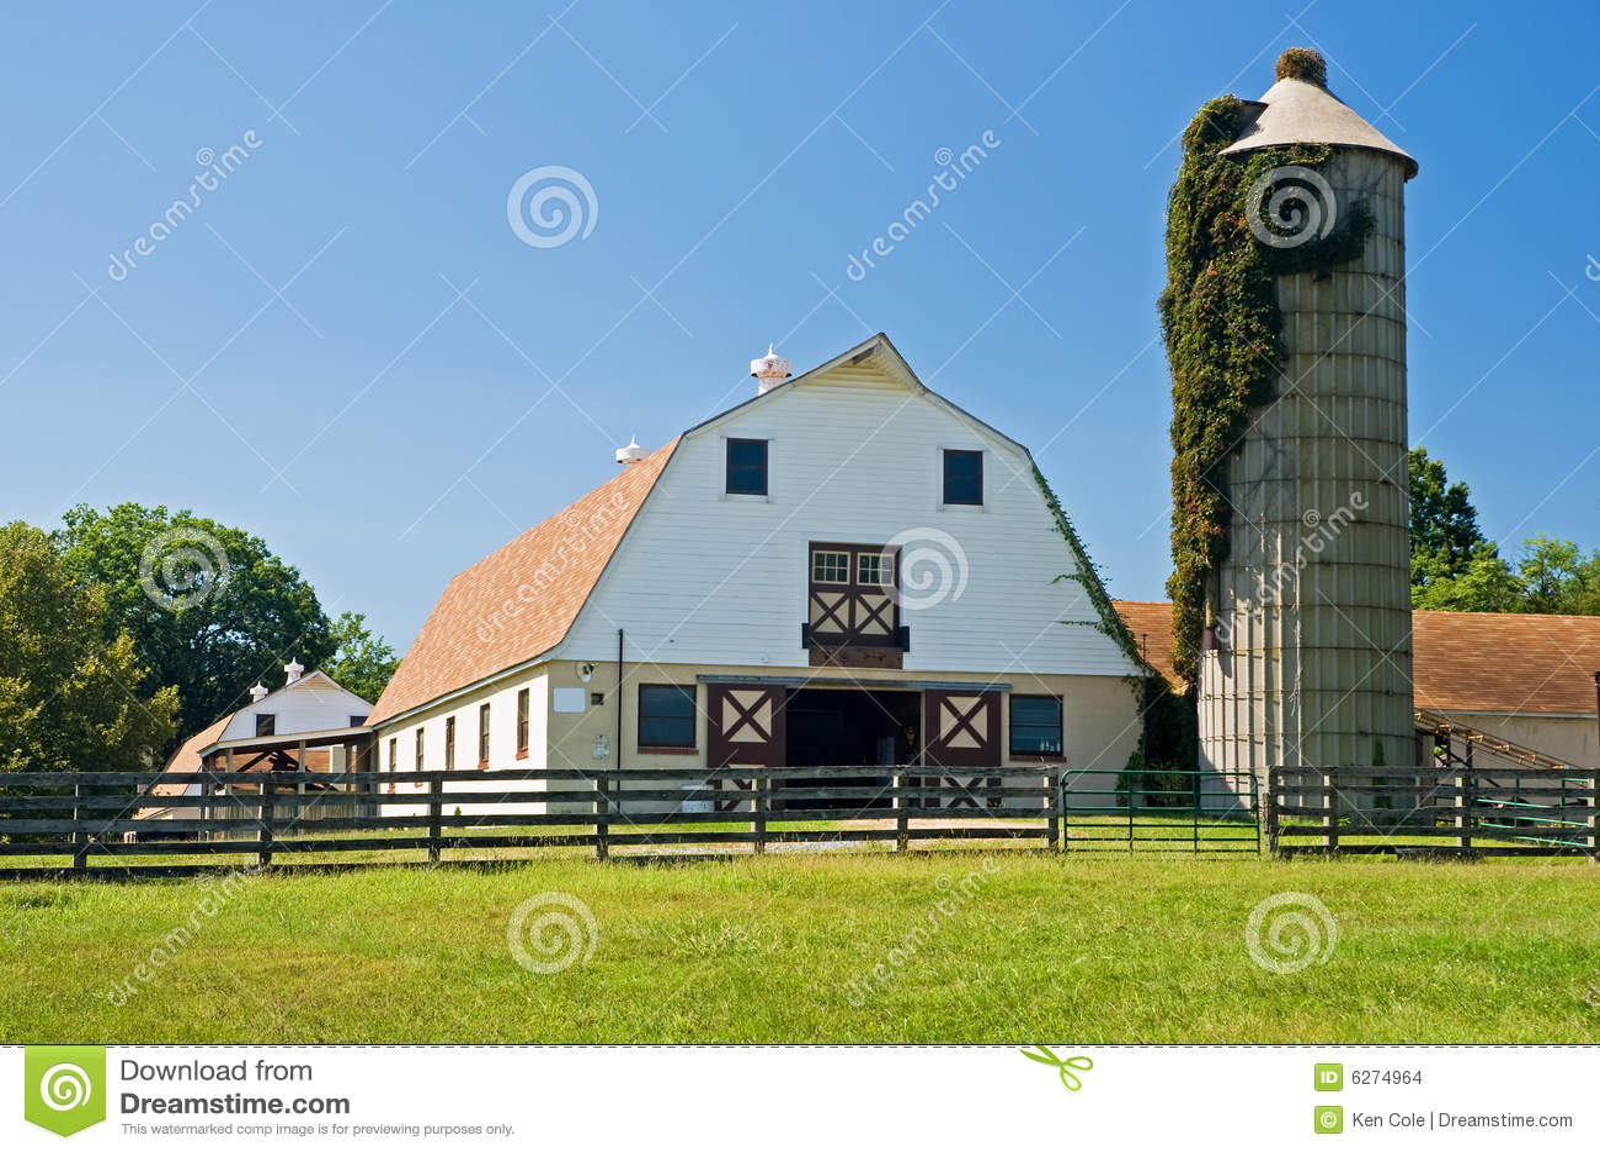 modern dairy farm design